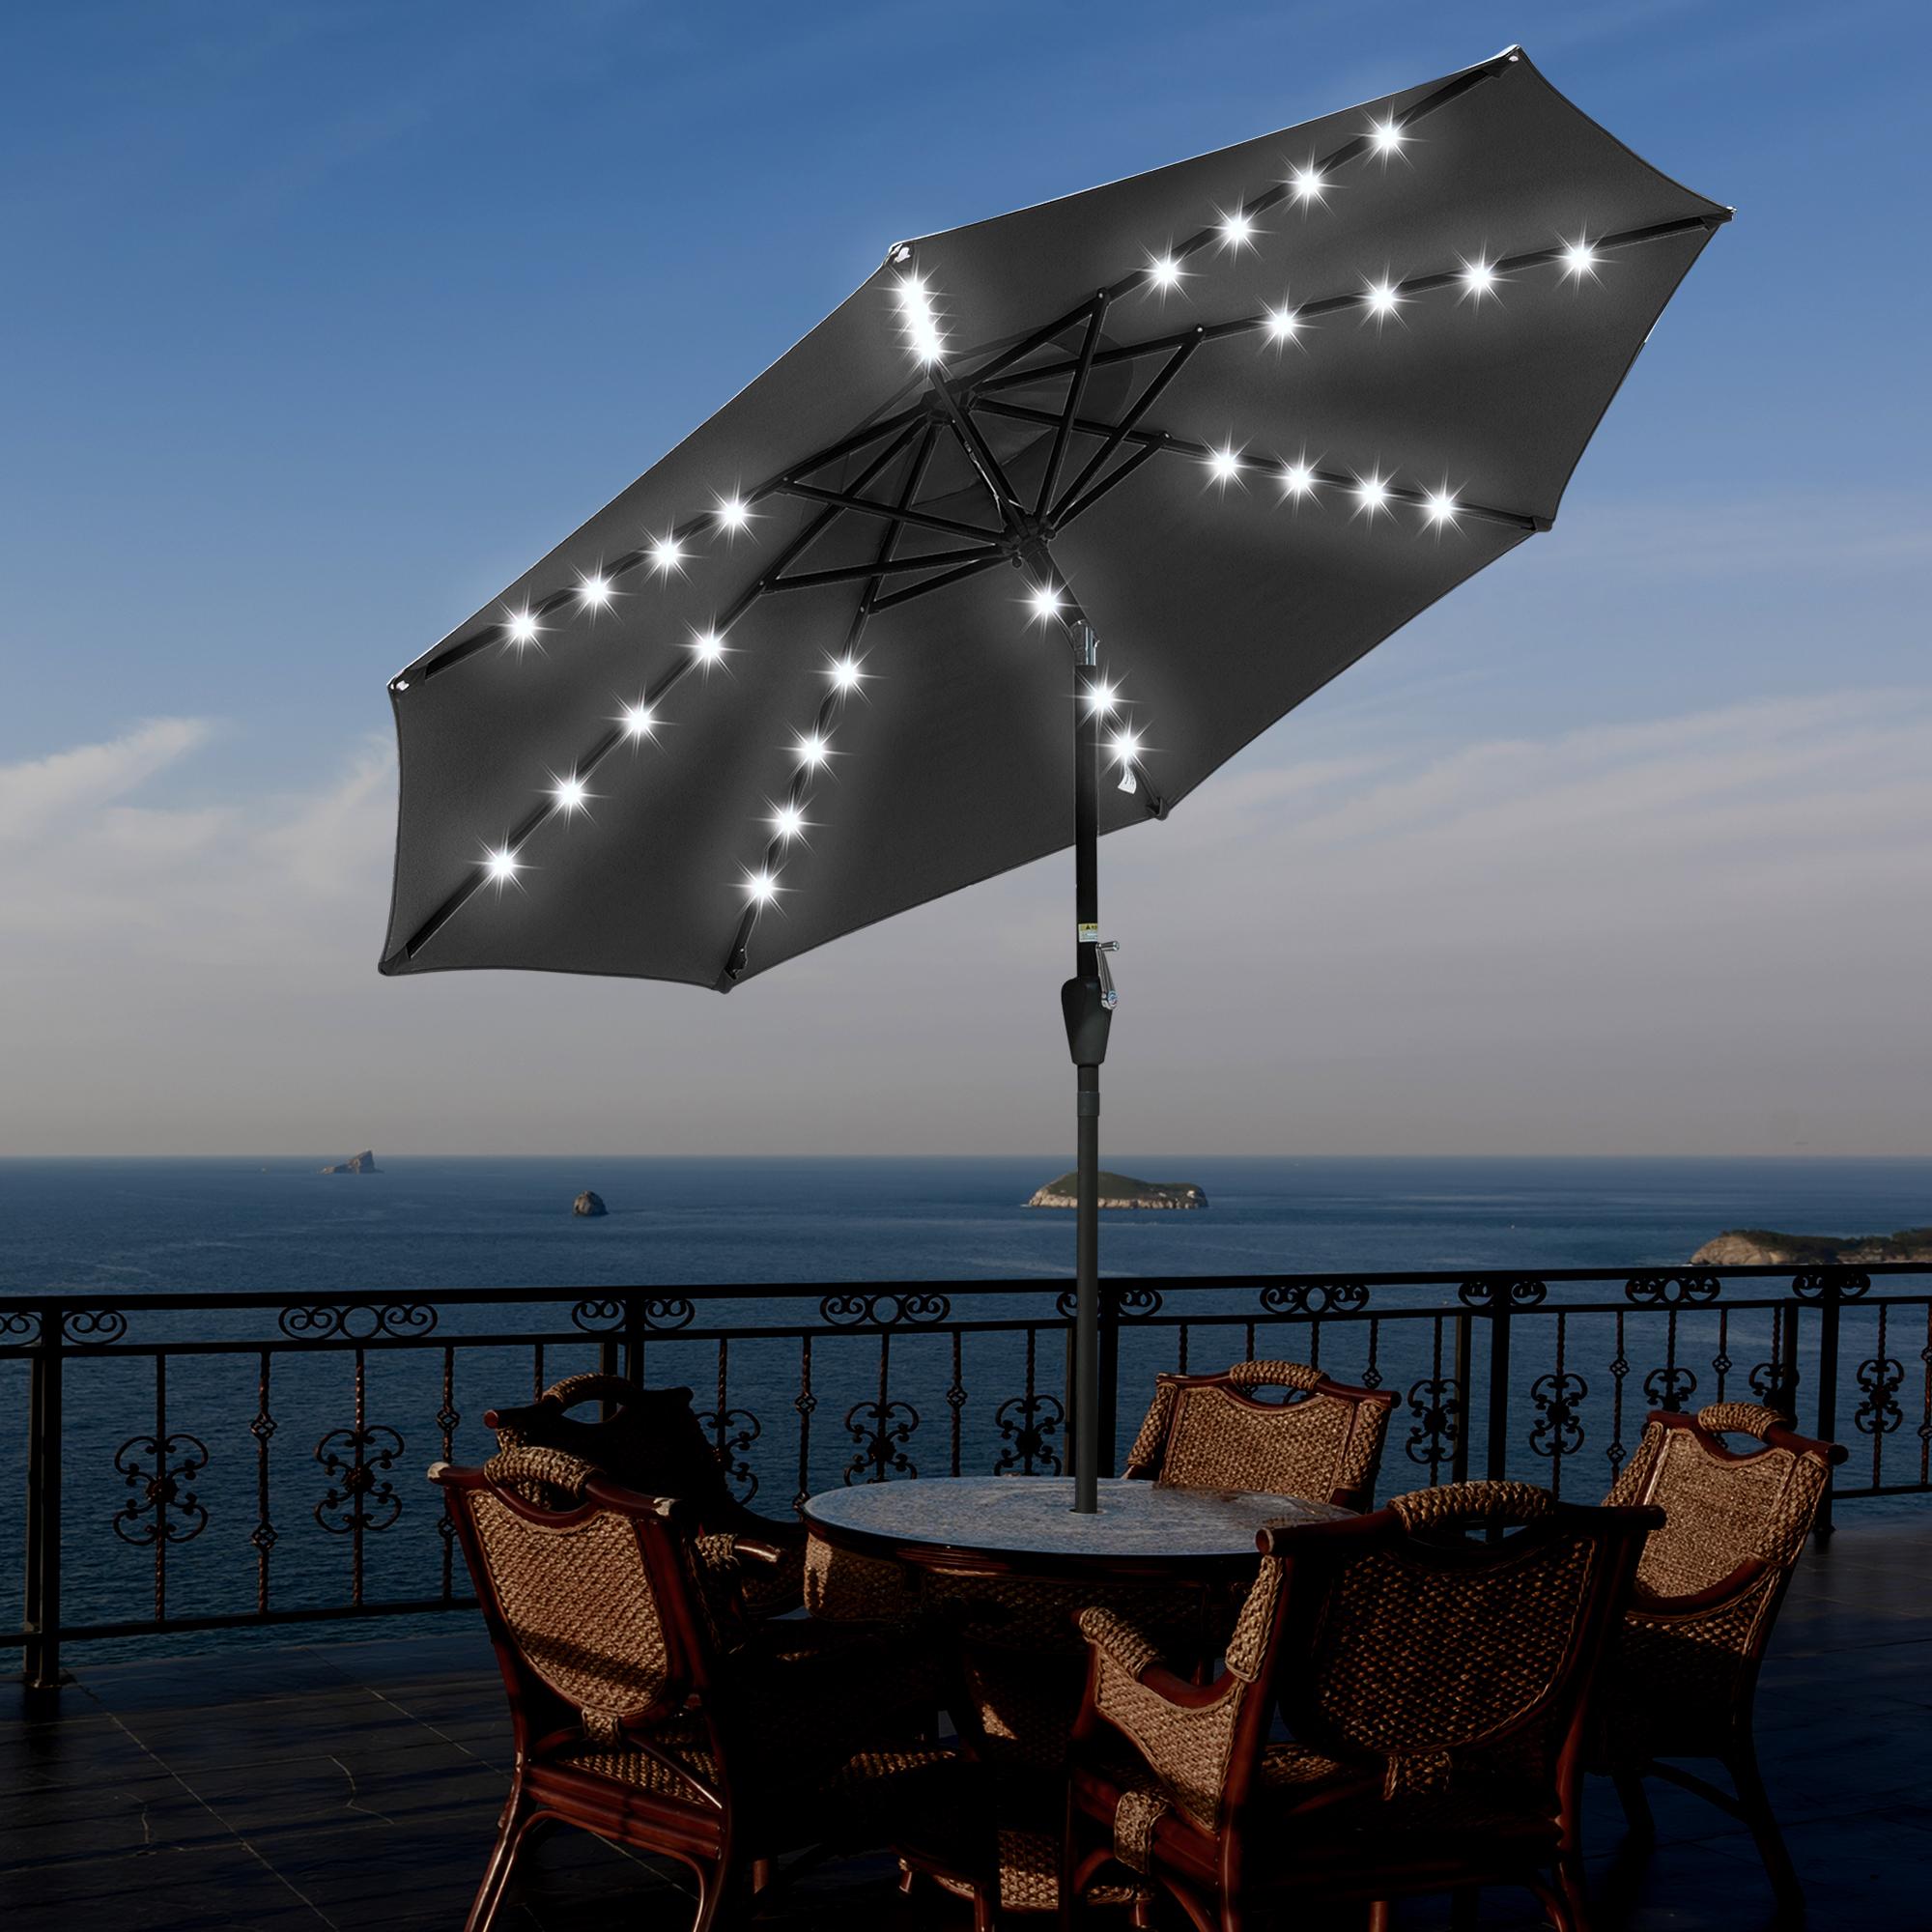 thumbnail 32 - 9' Patio Outdoor Umbrella Solar LED 8 Rib Garden Parasol Yard Deck Table Shade